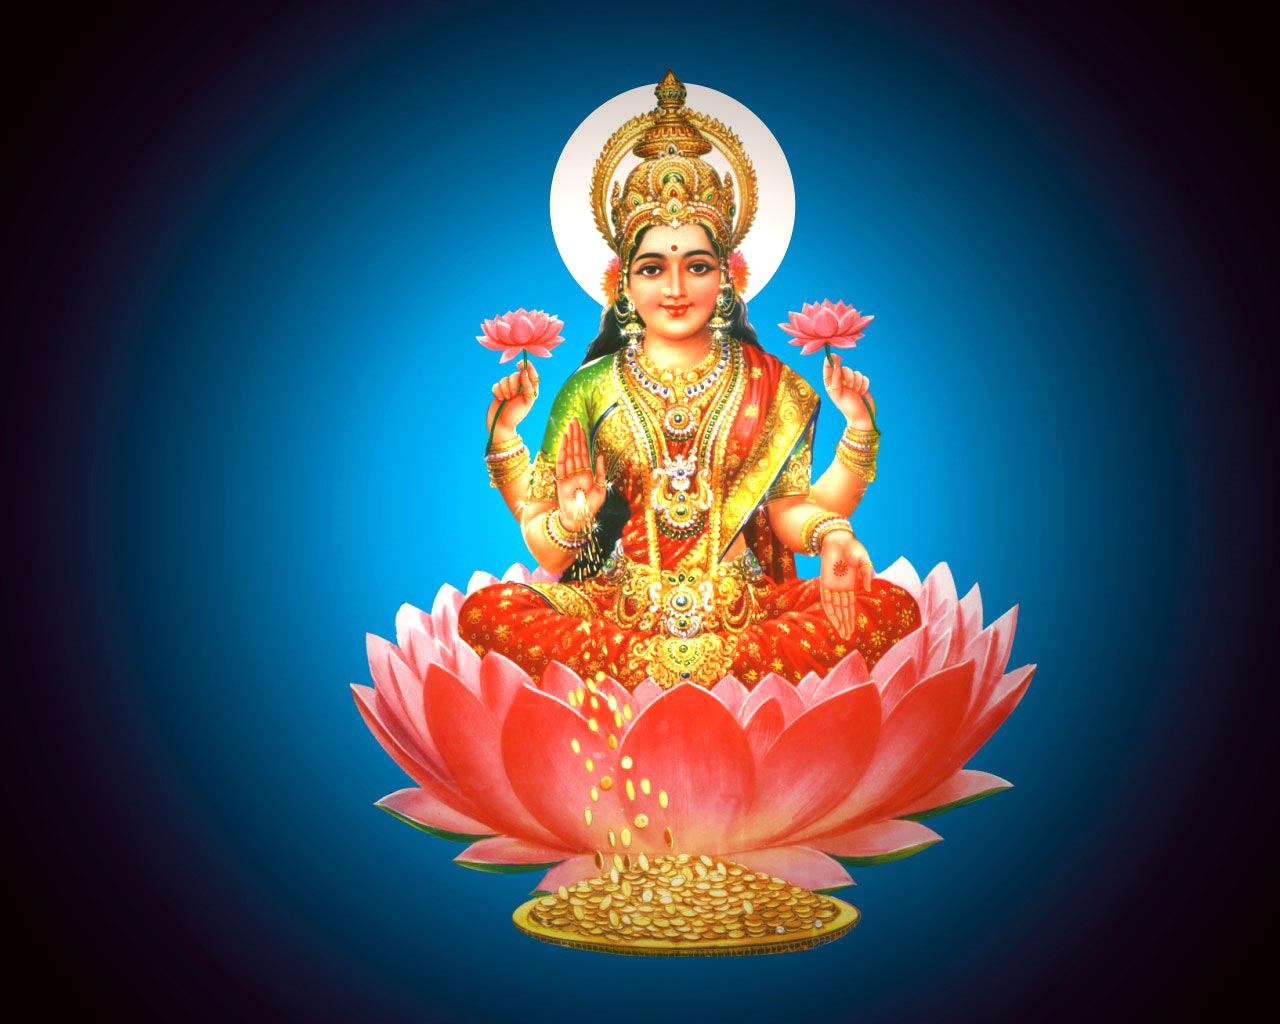 Beautiful Lakshmi Devi Wallpapers Photos Free Download